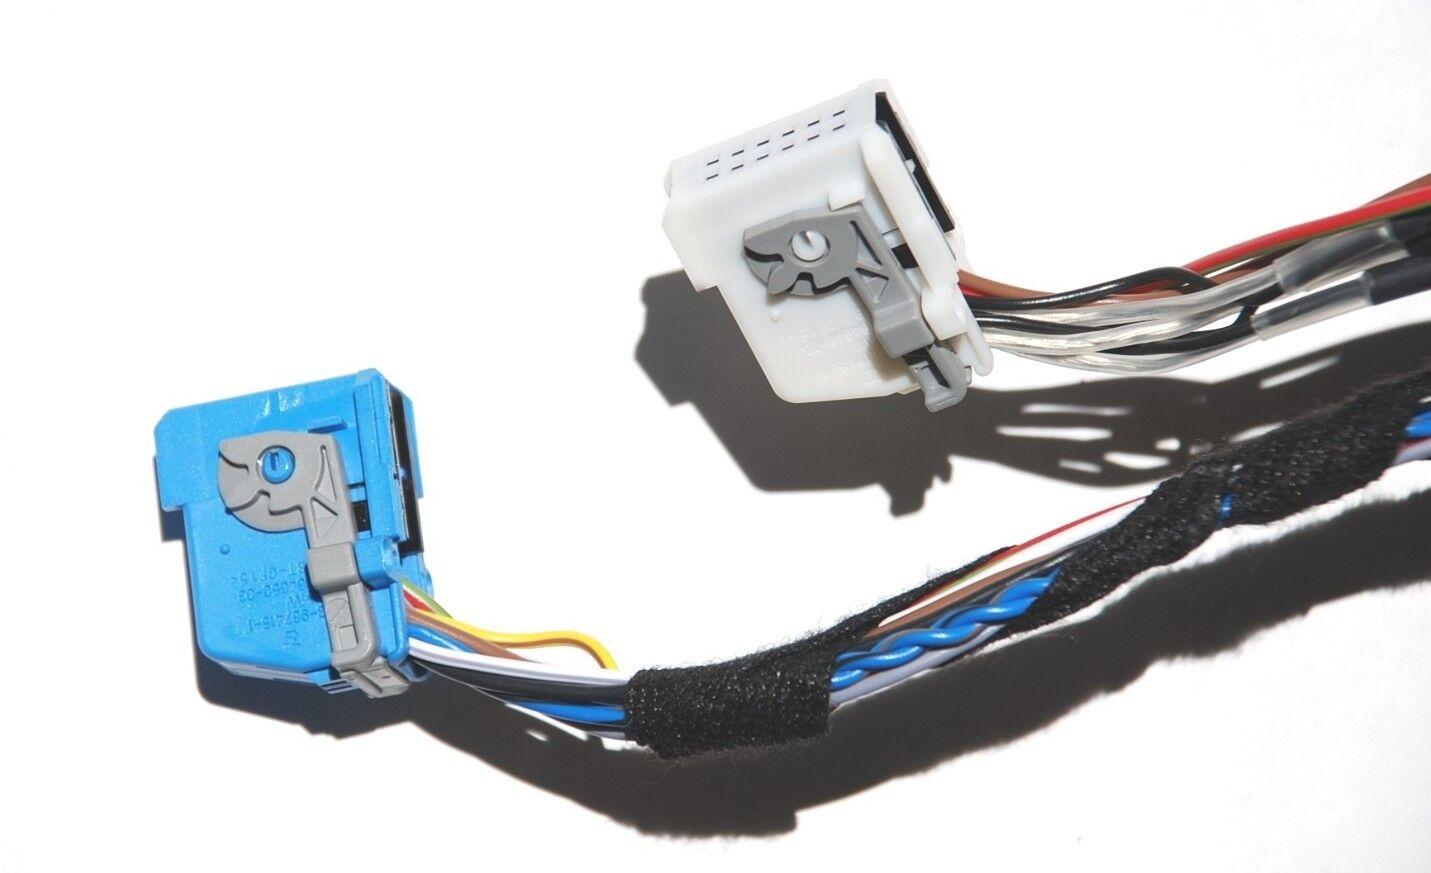 Mercedes Radio Wiring Adapter Not Lossing Diagram Peterbilt Harness Bmw E46 3 Series M3 Navigation System Retrofit